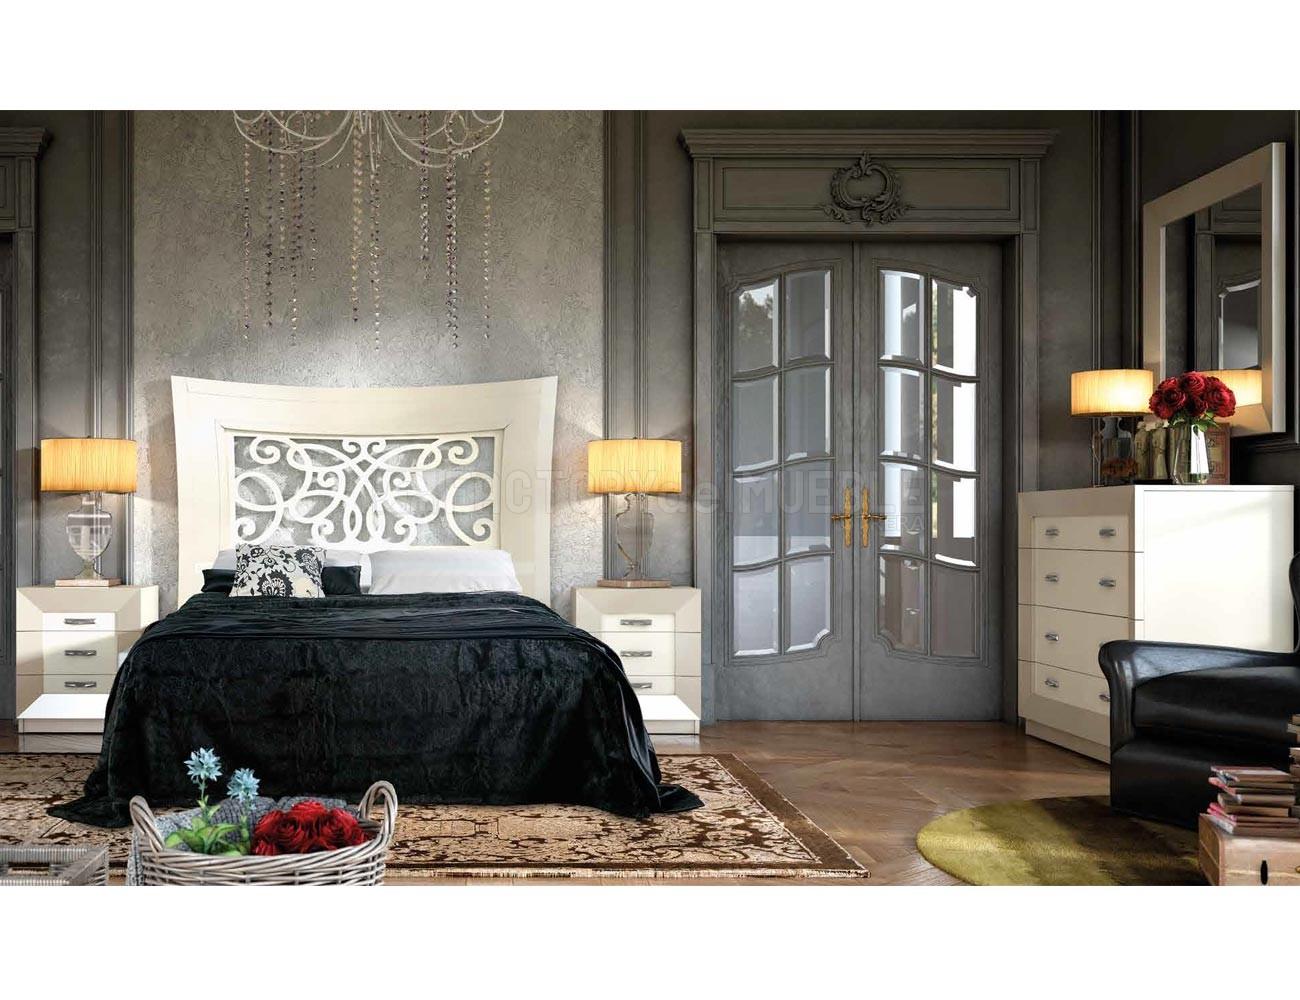 Dormitorio matrimonio madera neoclasico